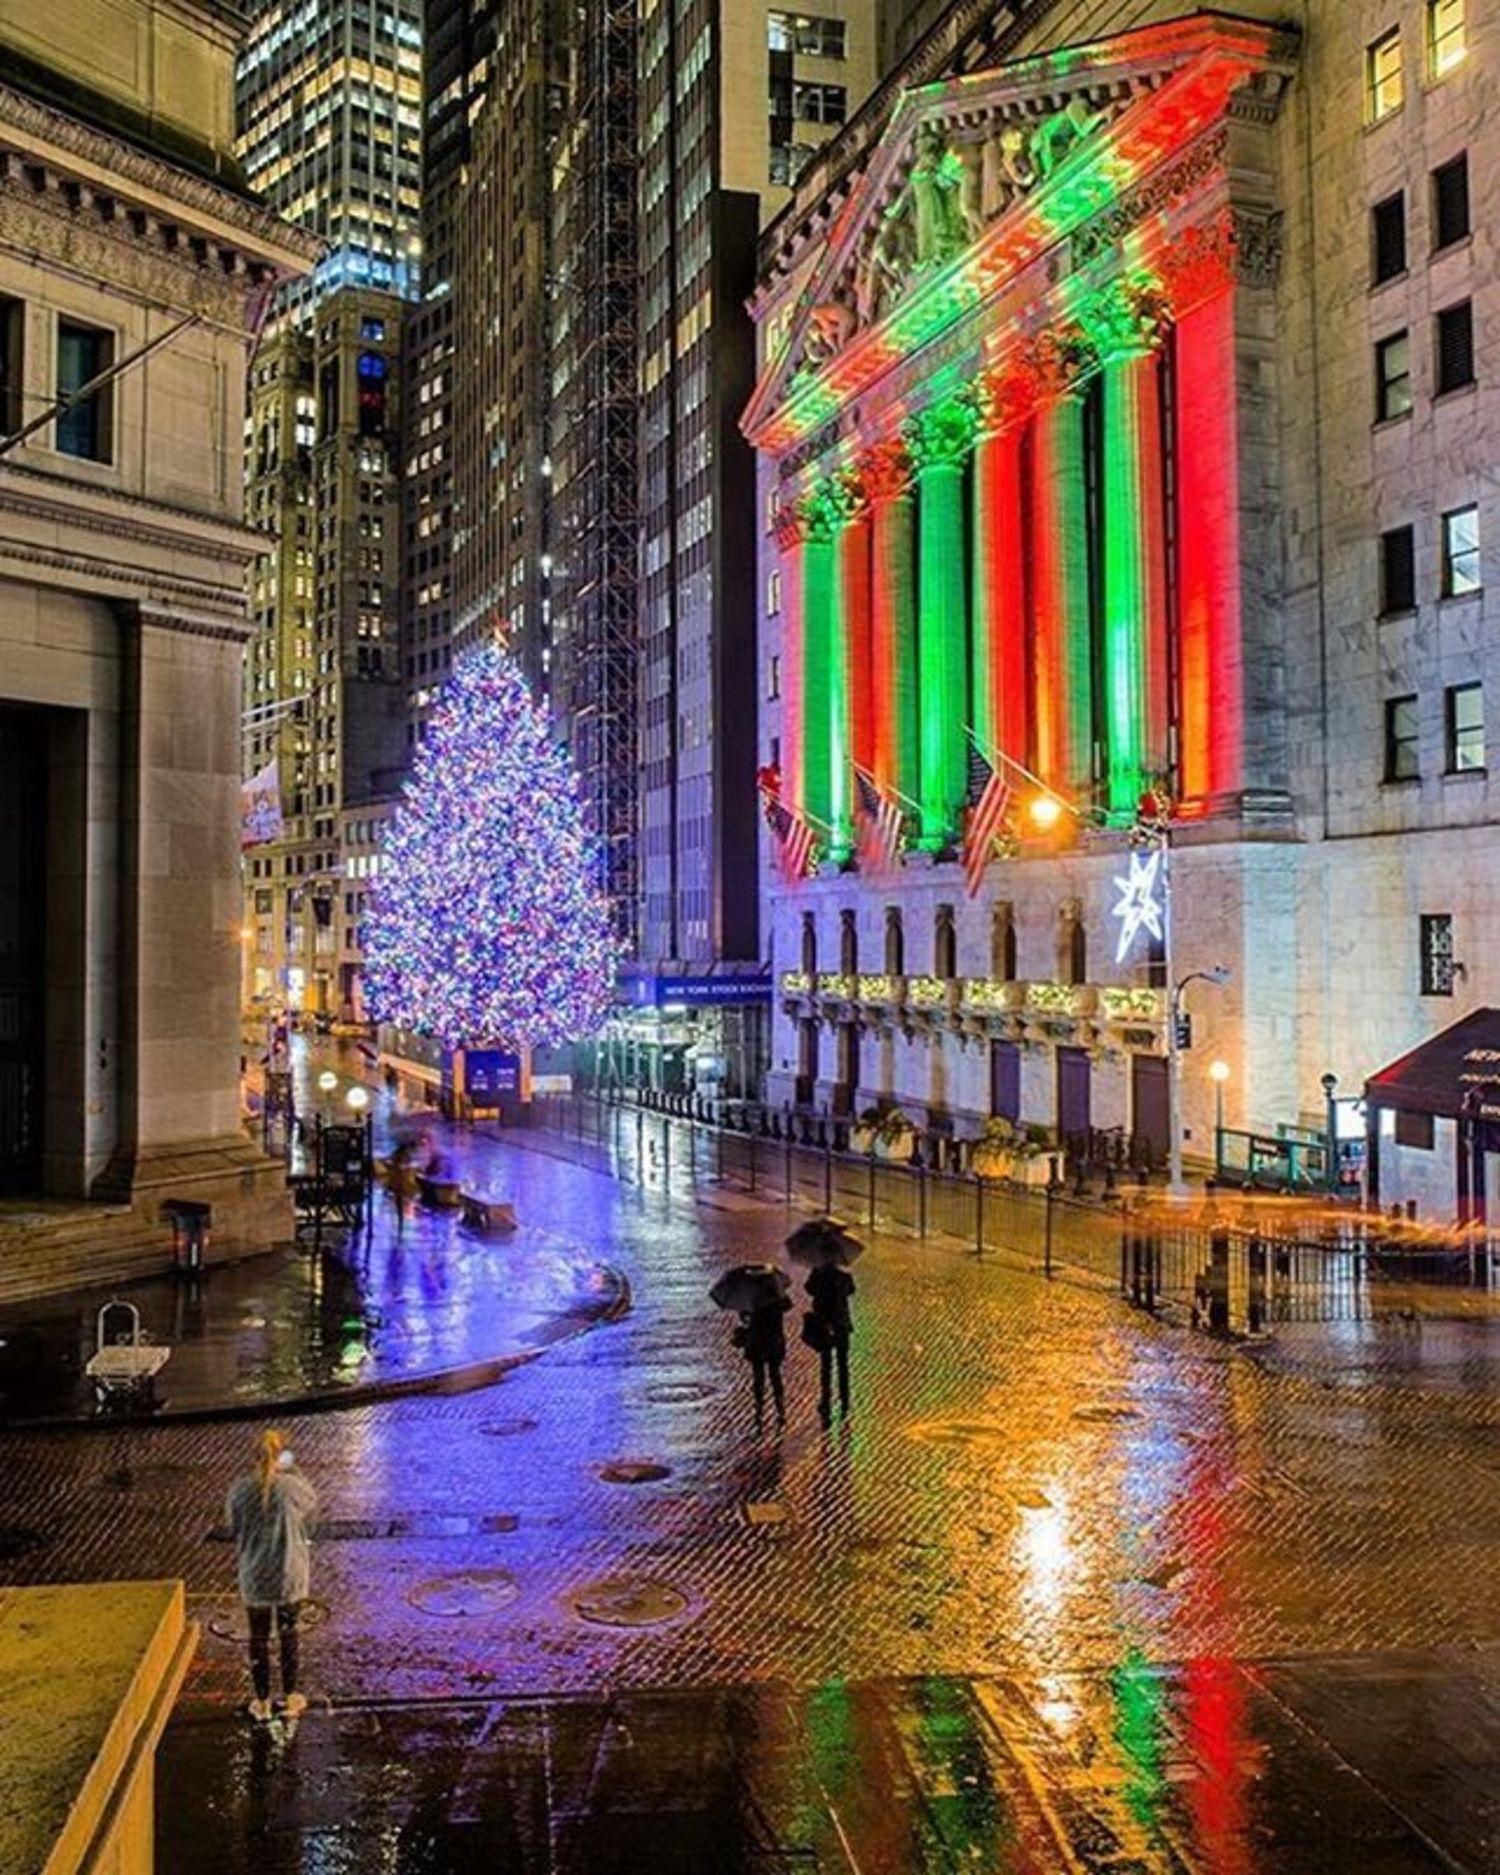 New York, New York. Photo via @matthewchimeraphotography #viewingnyc #newyork #newyorkcity #nyc